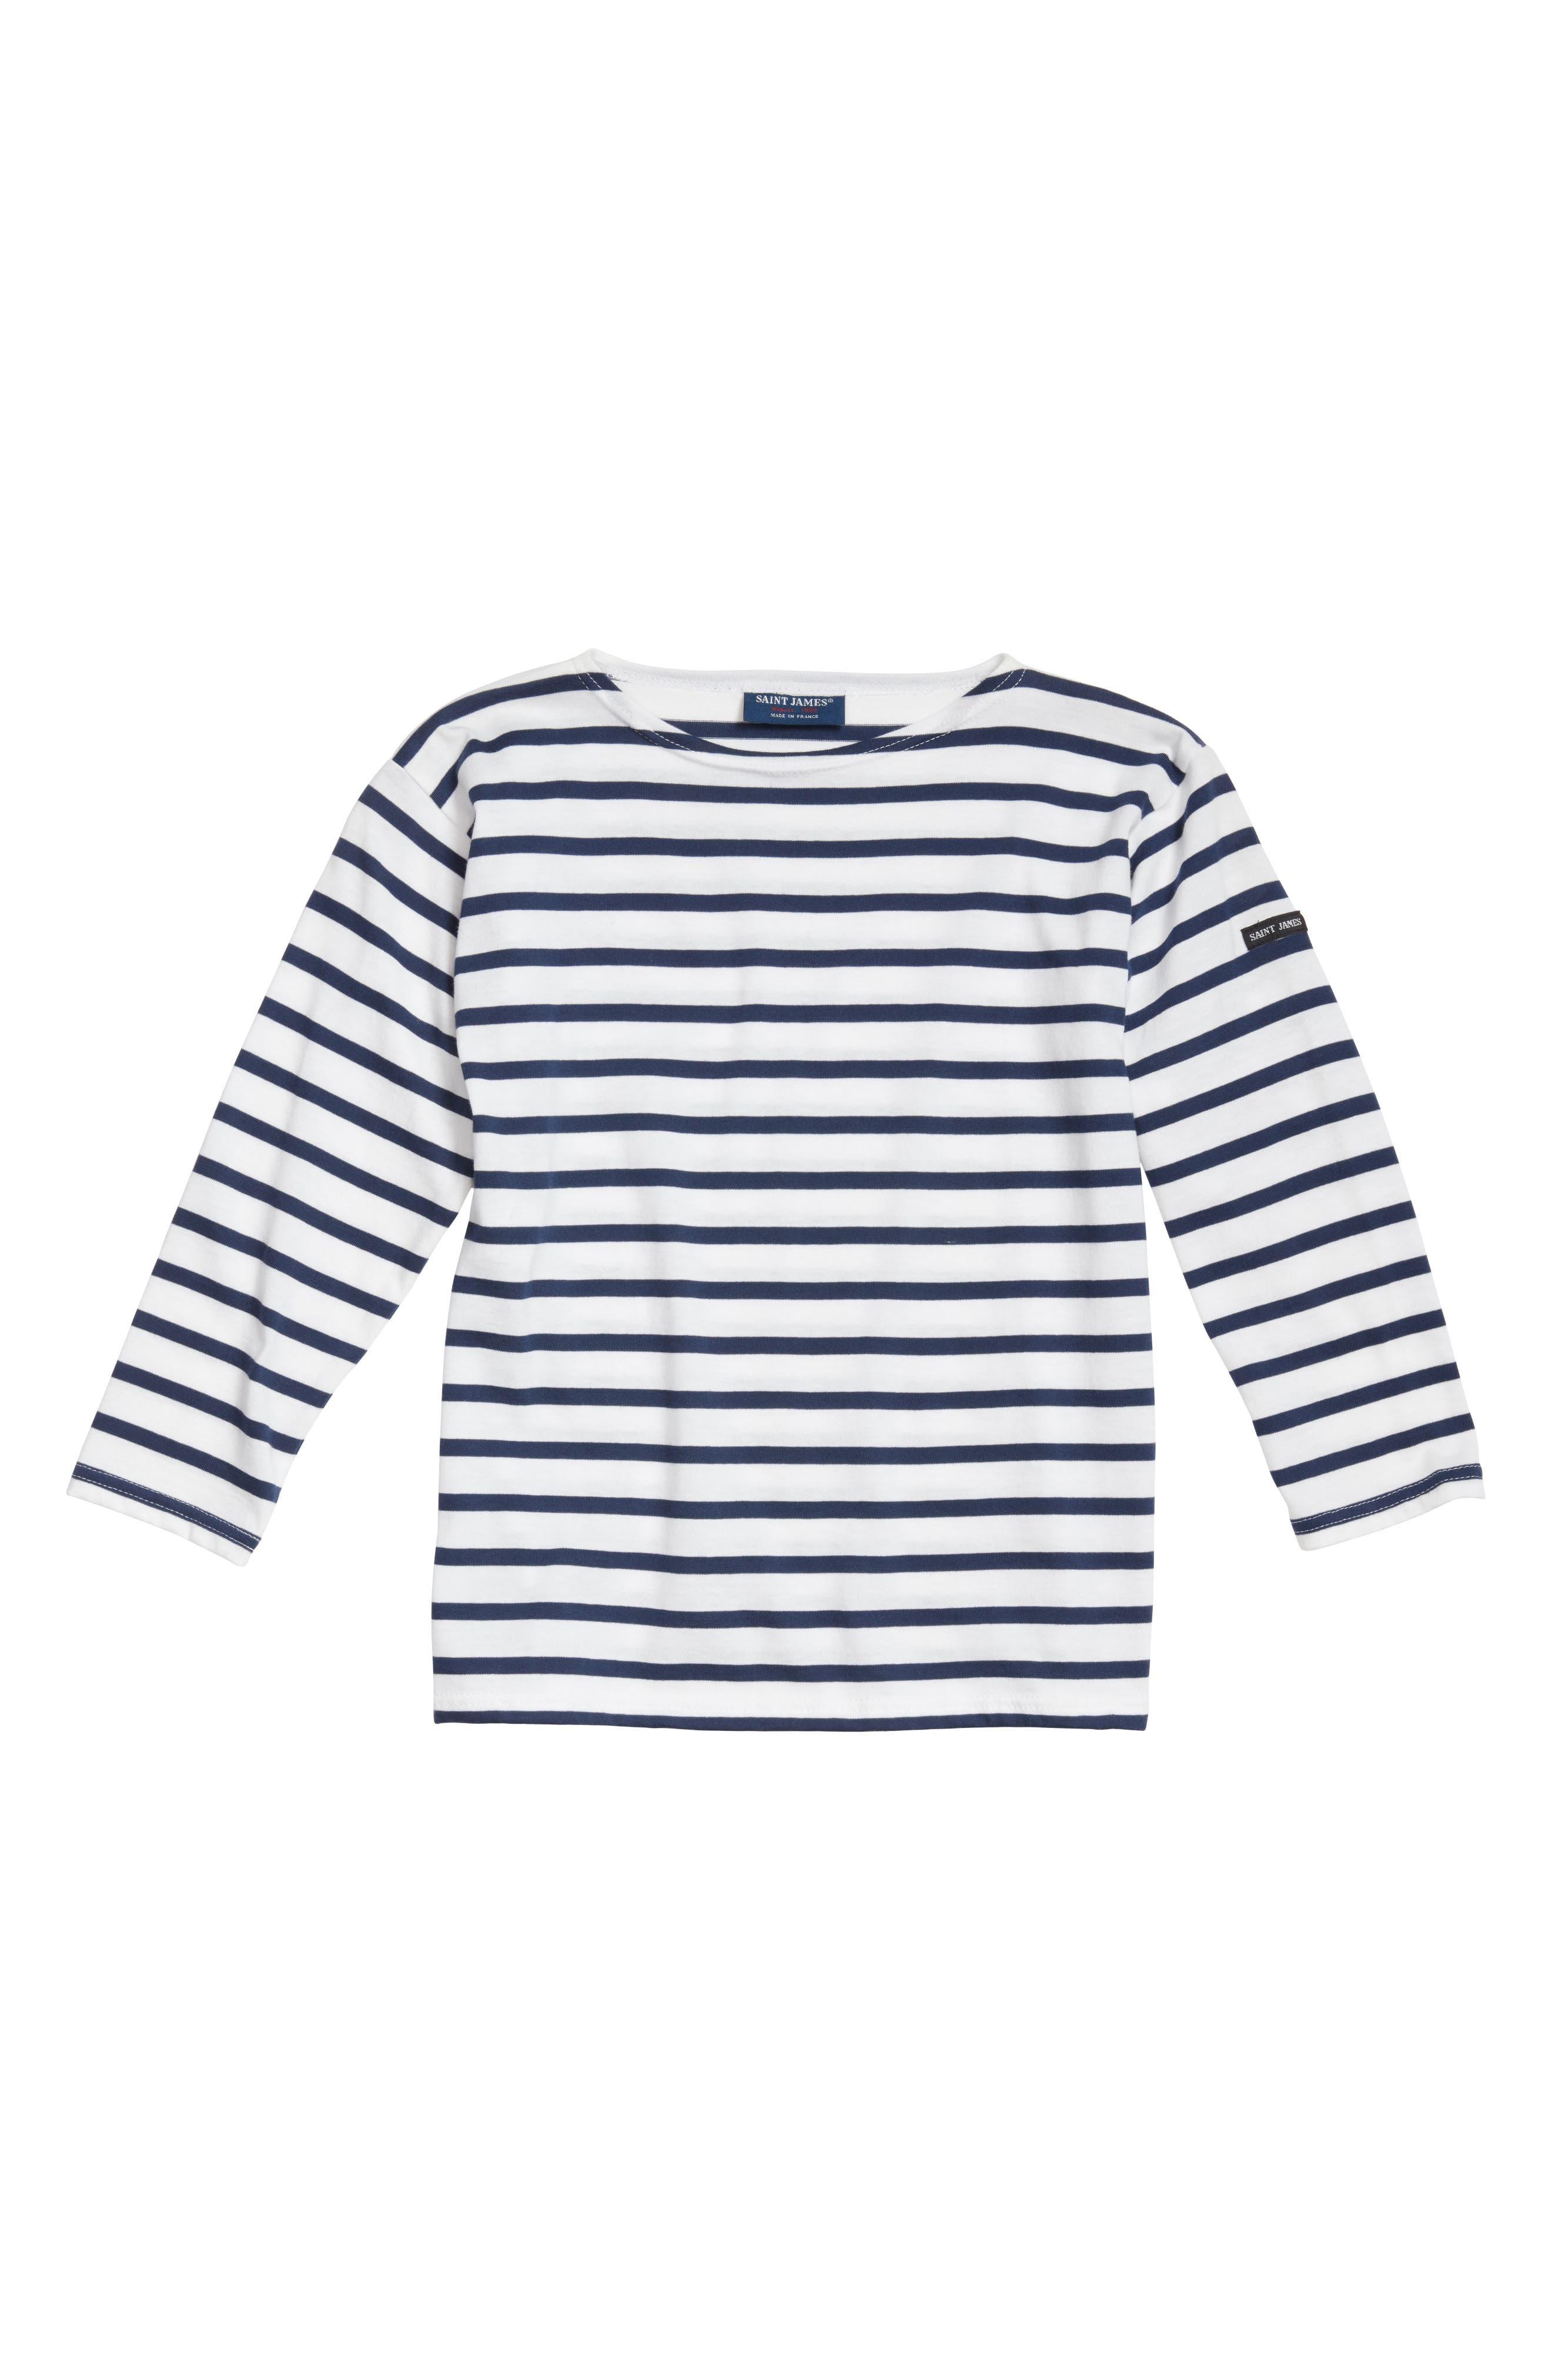 Alternate Image 1 Selected - Saint James Minquiers Kids Striped Sailor Shirt (Toddlers, Little Kids & Big Kids)